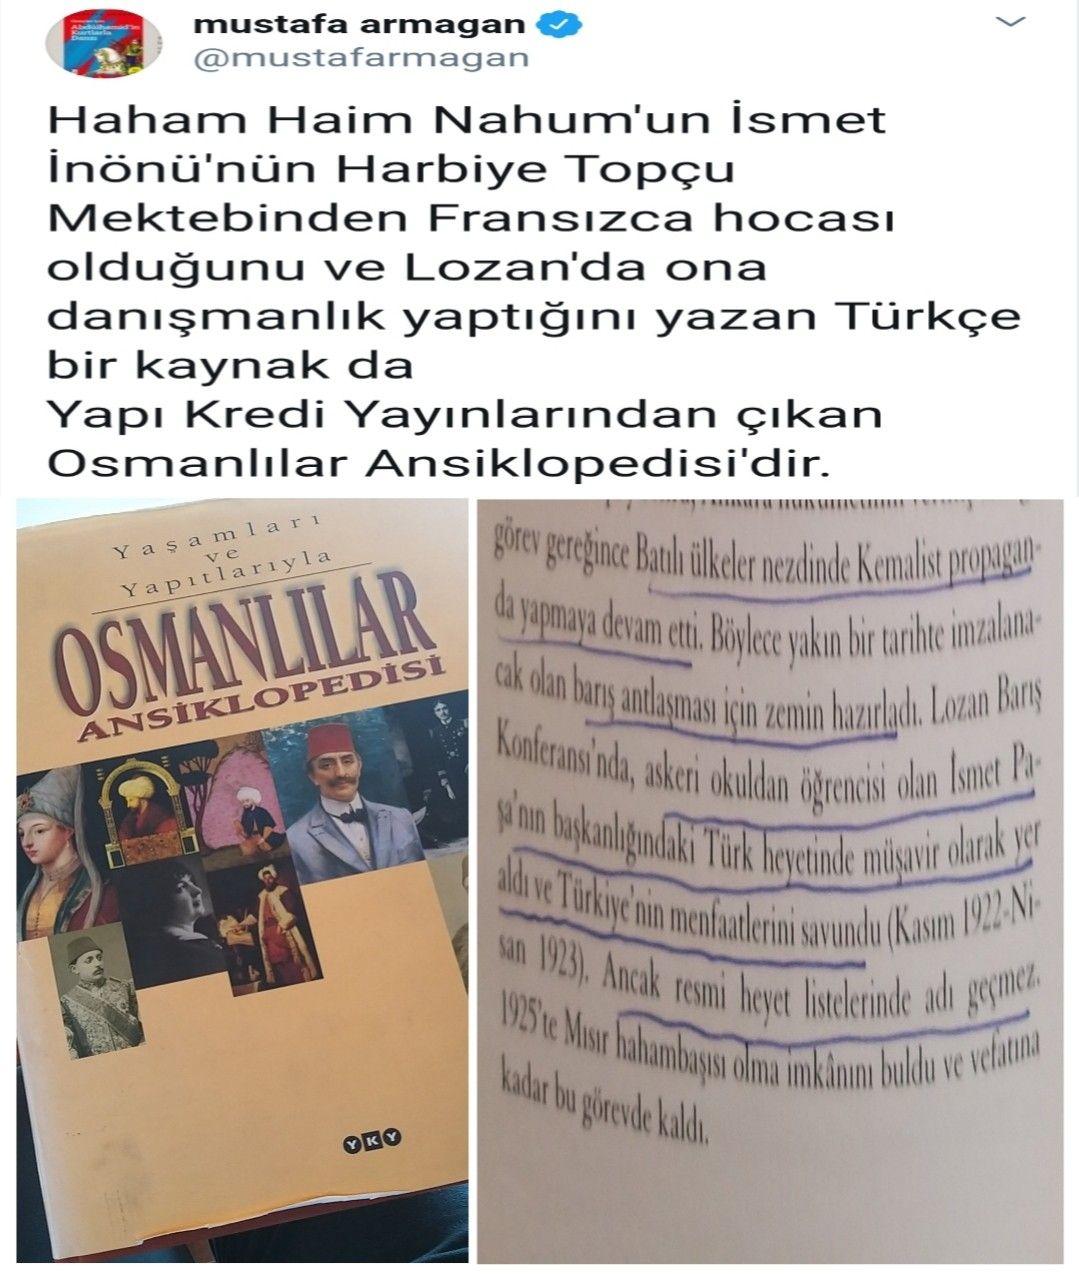 Haimnahum Ismetinonu Fransa Lozan Sanatci Gazeteci Milliyetci Ataturkcu Bozkurt Anitkabir Nutuk Erdogan Suriye Sondakika I Lozan Tarih Gercekler